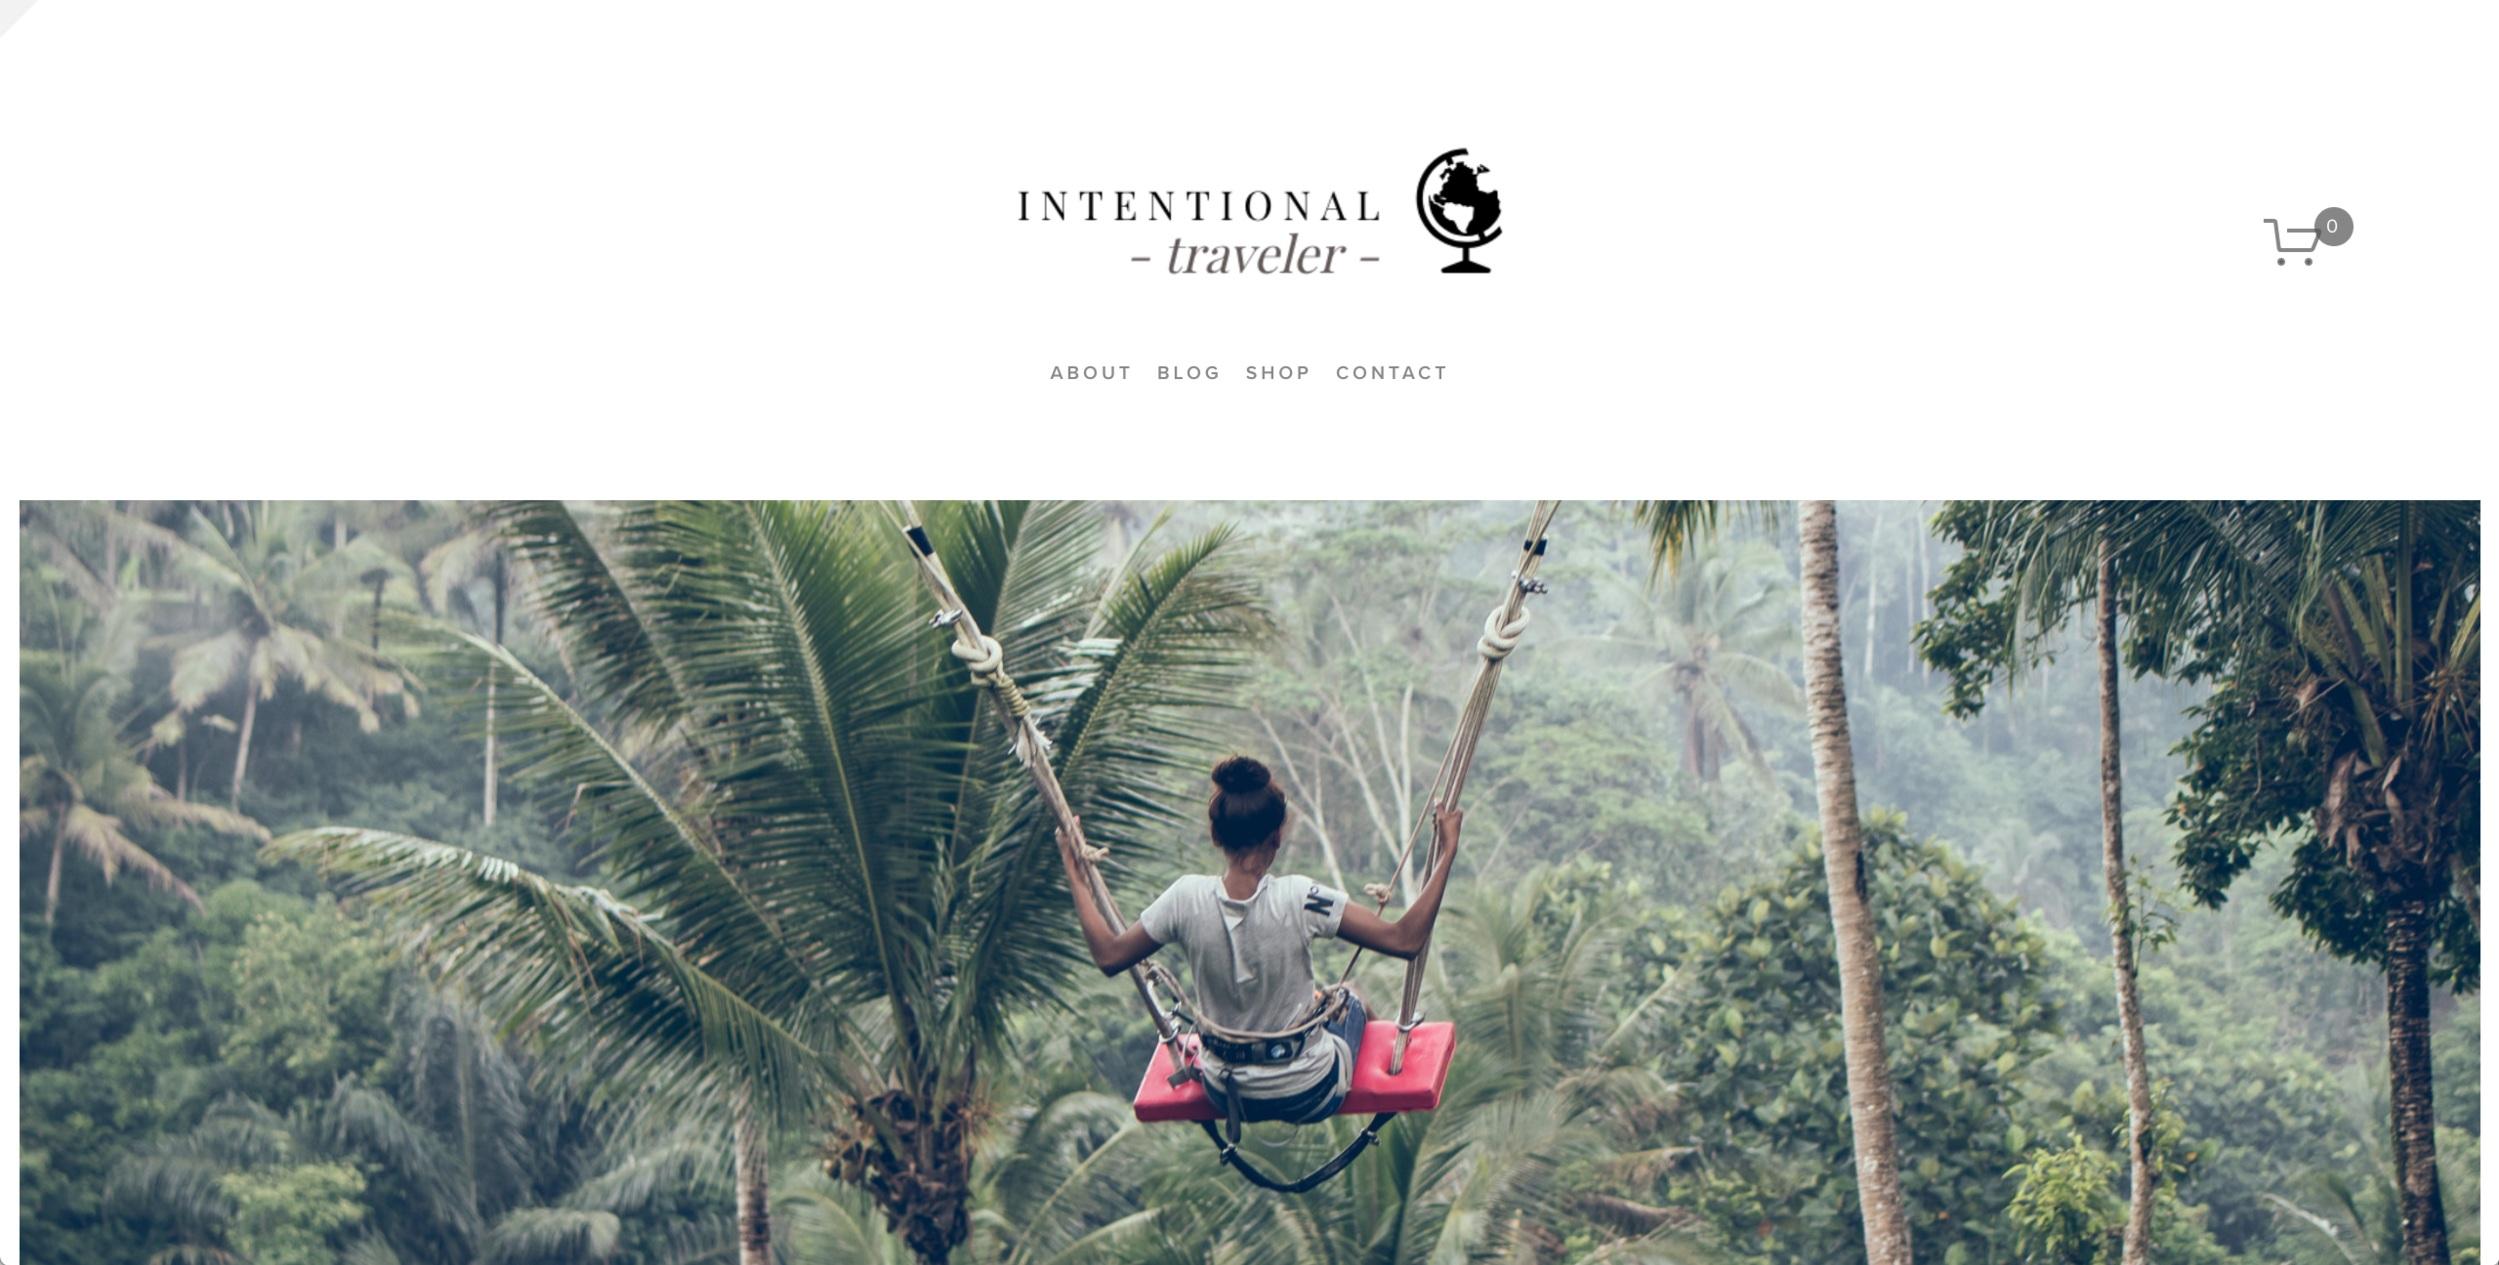 Intentional Traveler (Concept)